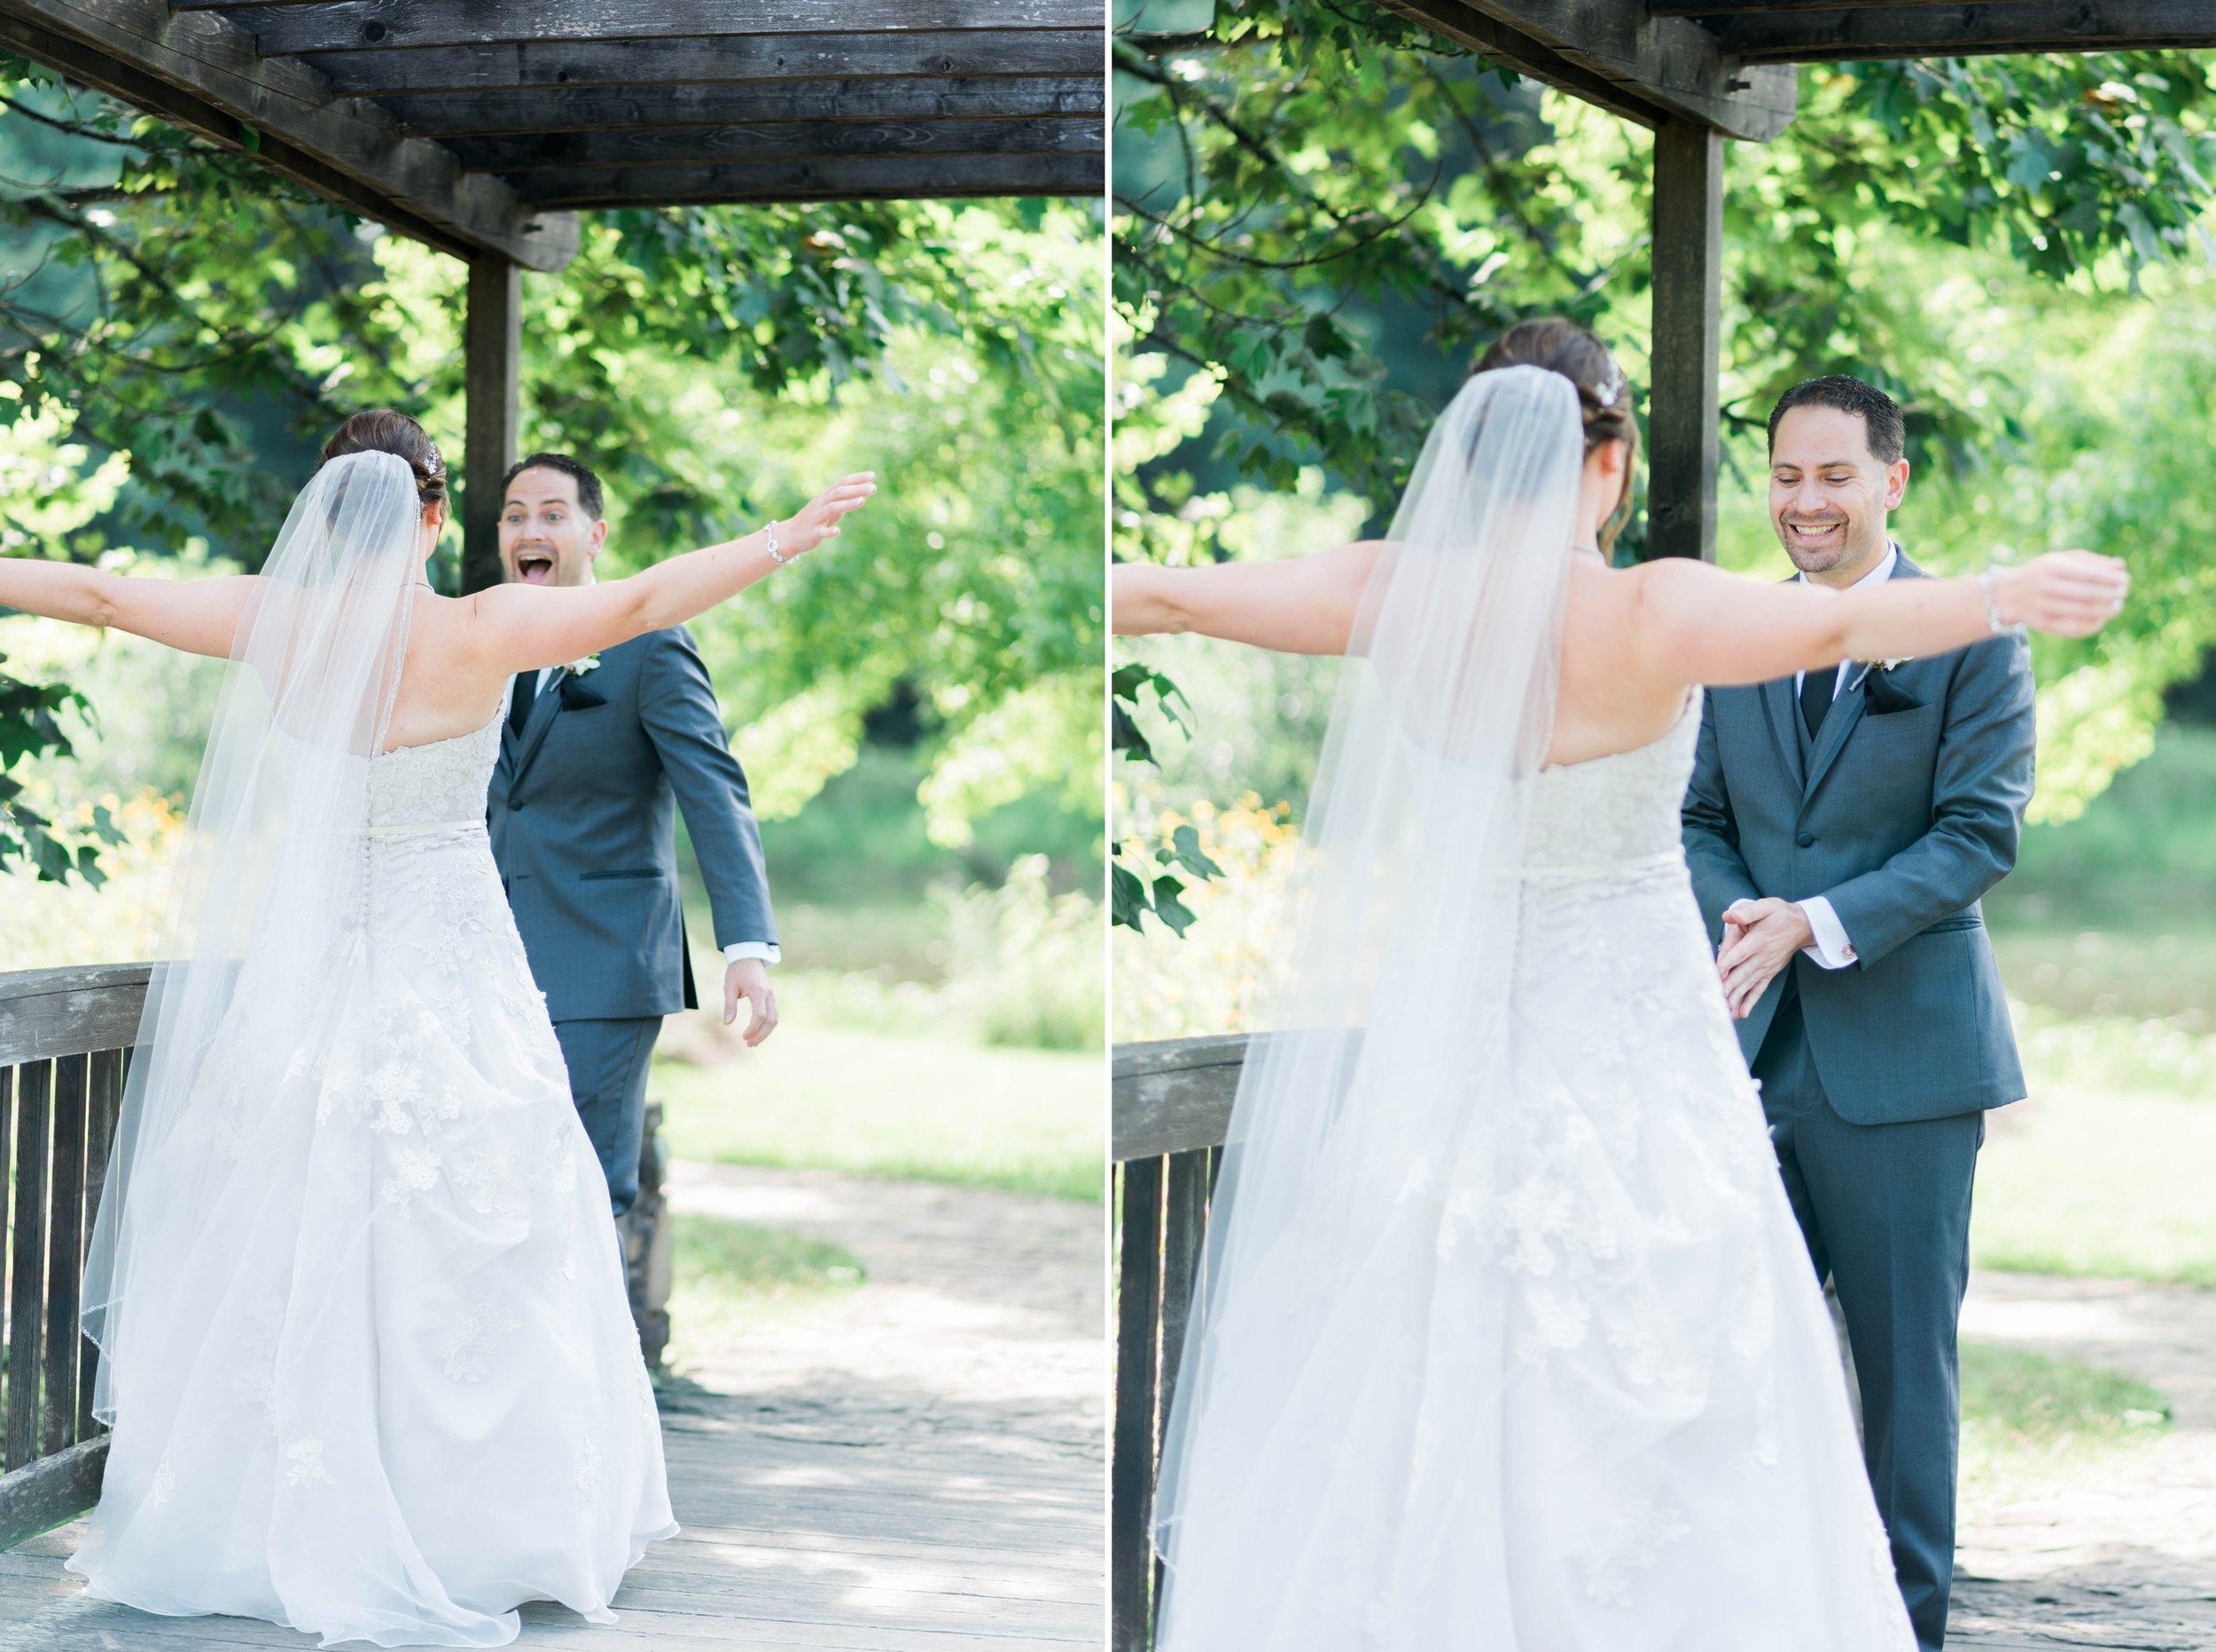 TheAtriumatMeadowlark_Virginiawedding photographer_lynchburgweddingphotographer_DCweddingPhotographer_KristinAaron 32.jpg